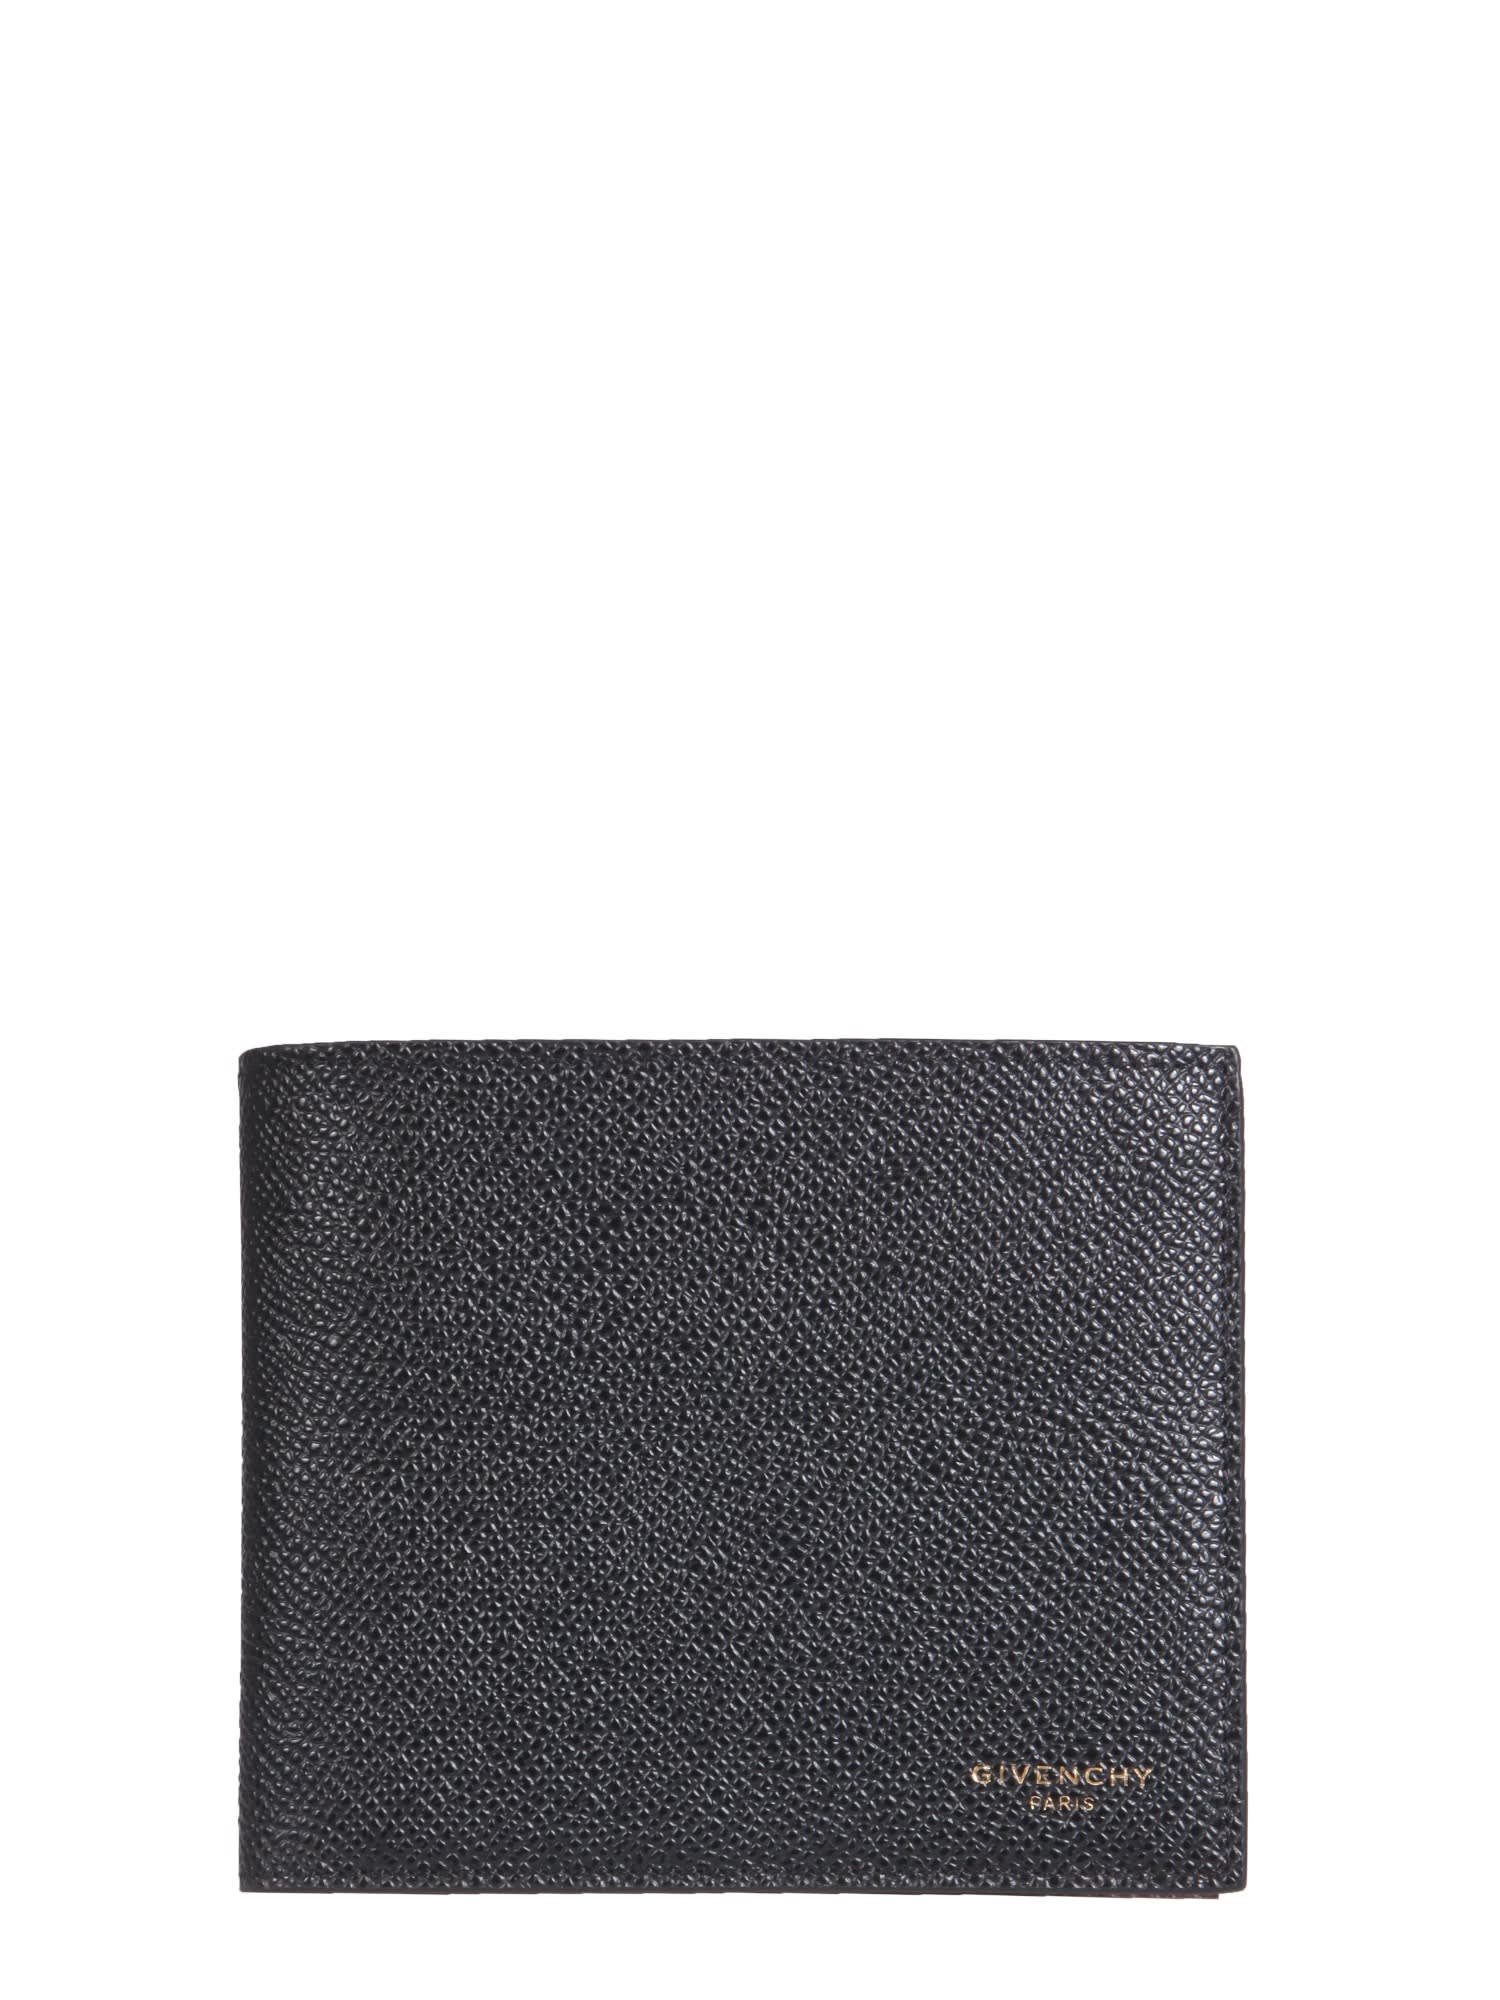 Givenchy BI-FOLD WALLET